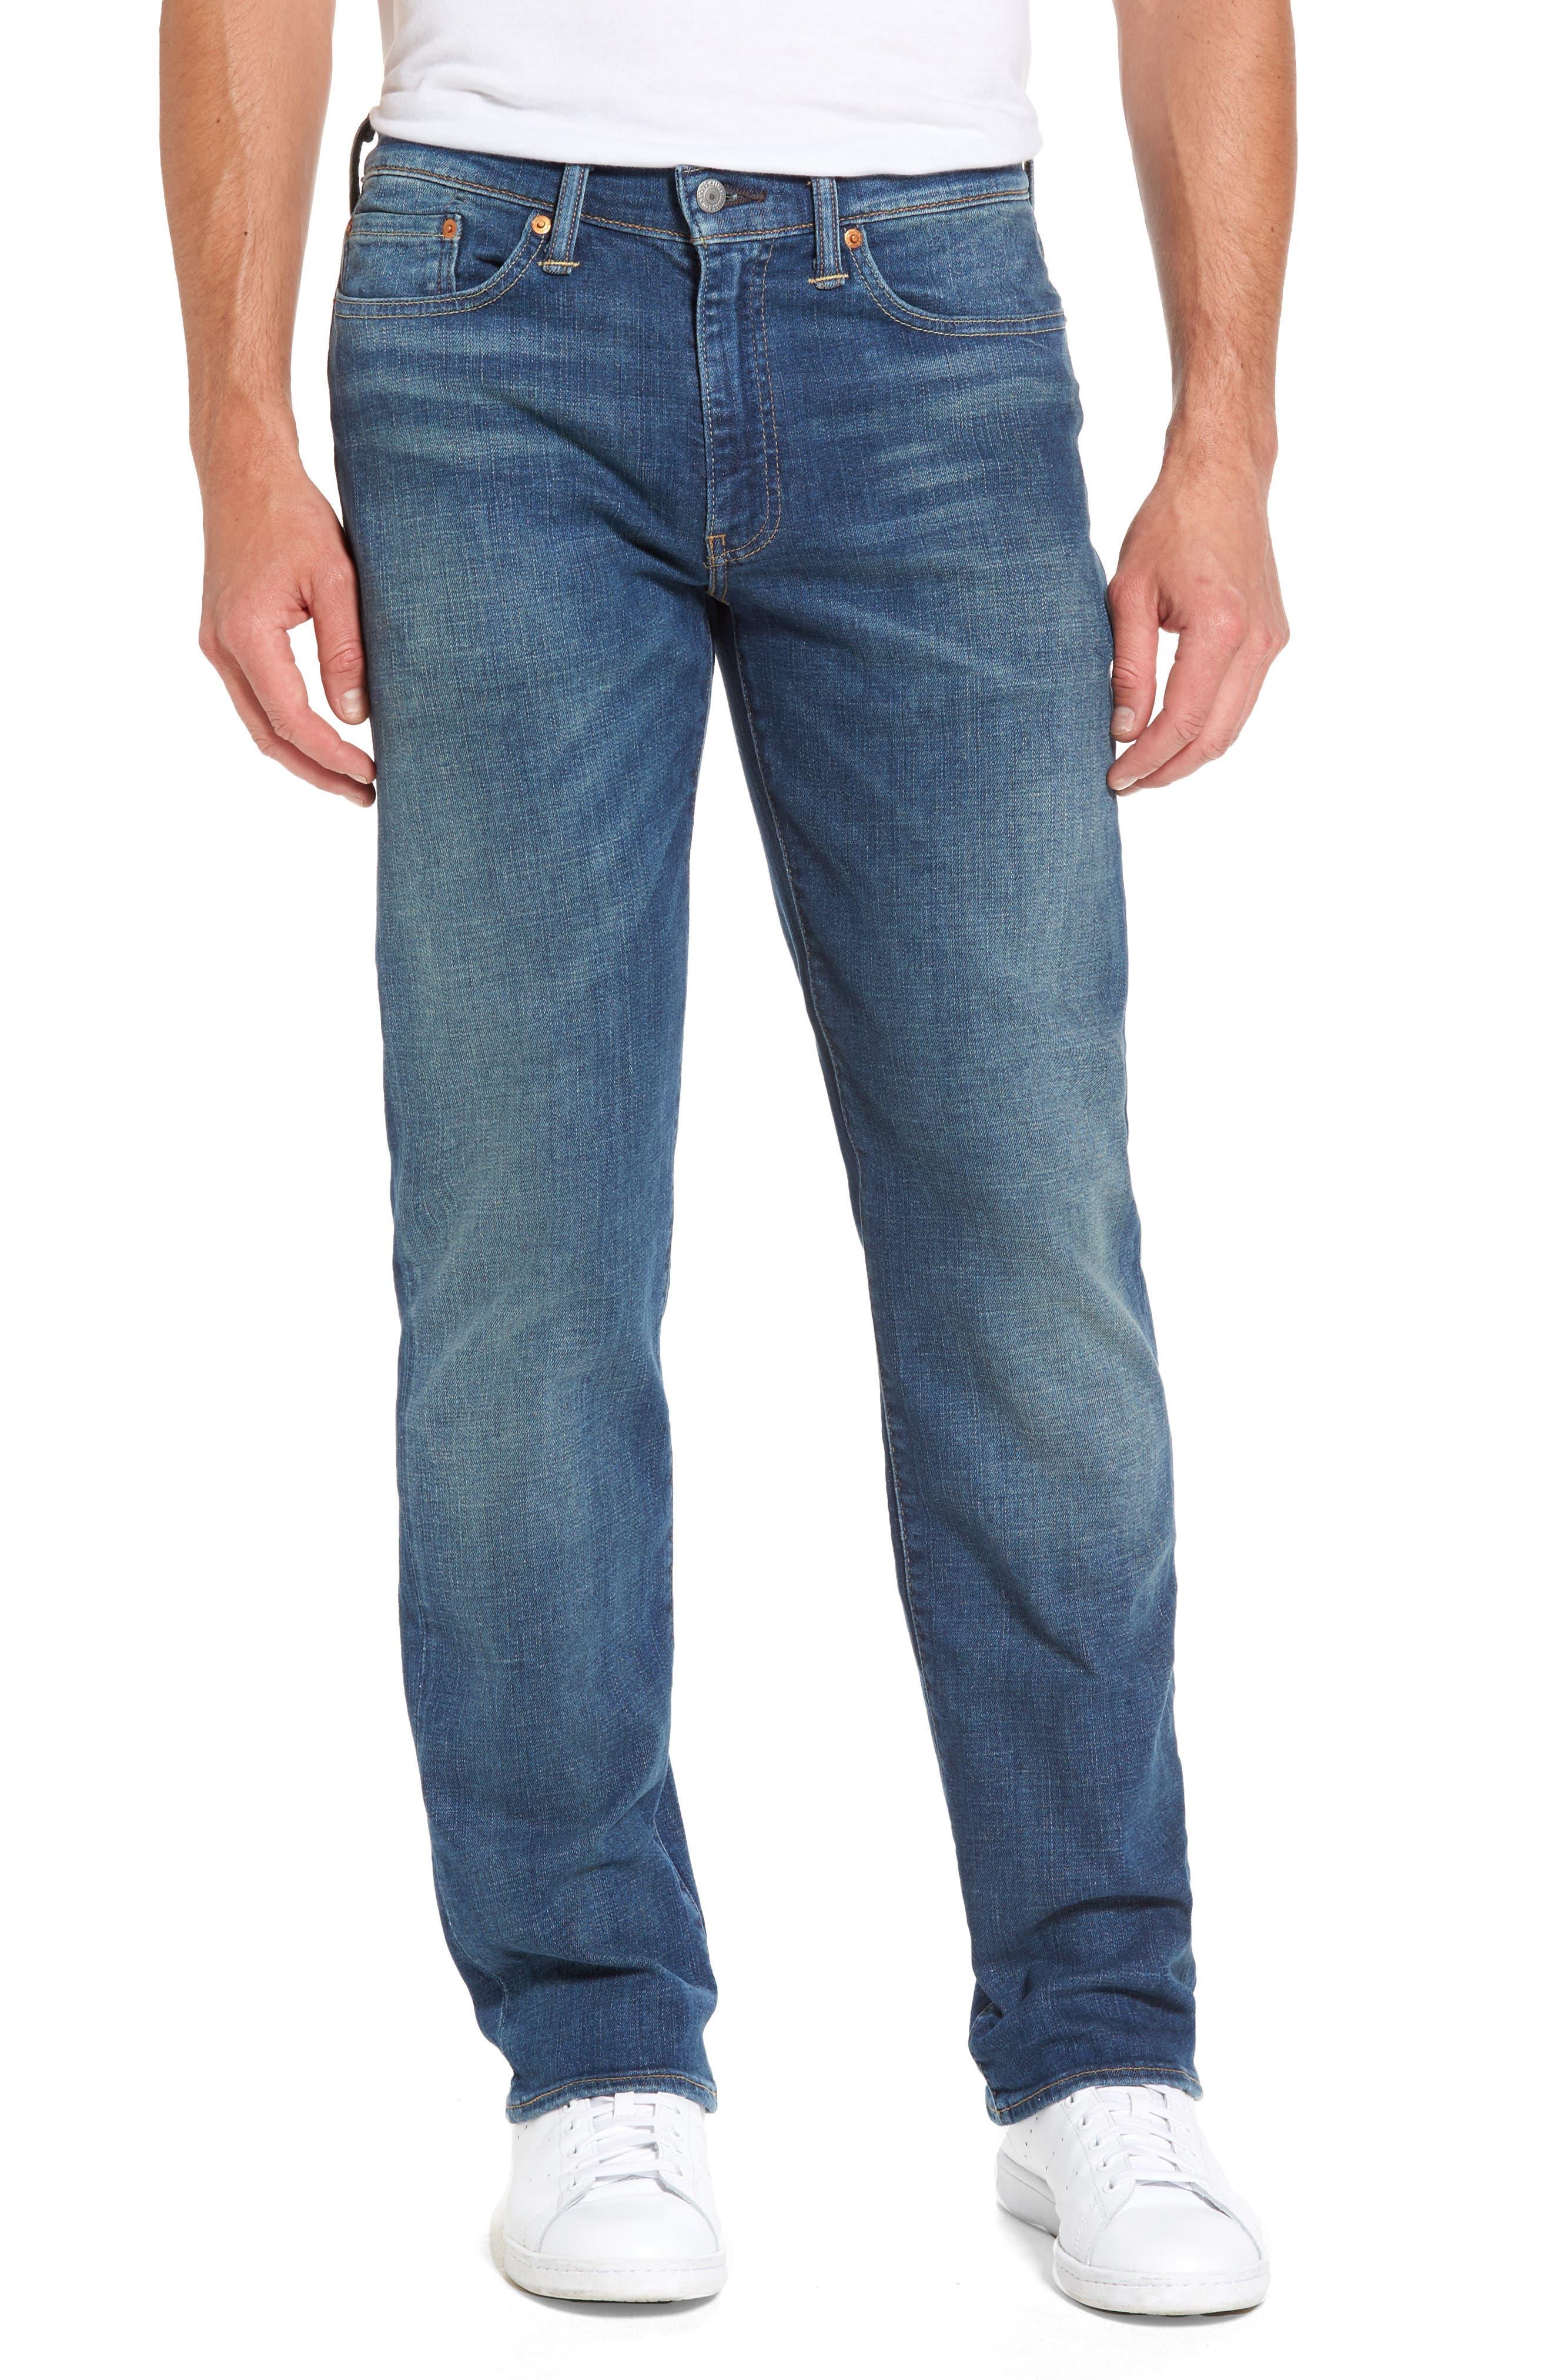 Alternate Image 1 Selected - Levi's® 514™ Straight Leg Jeans (Yoke)